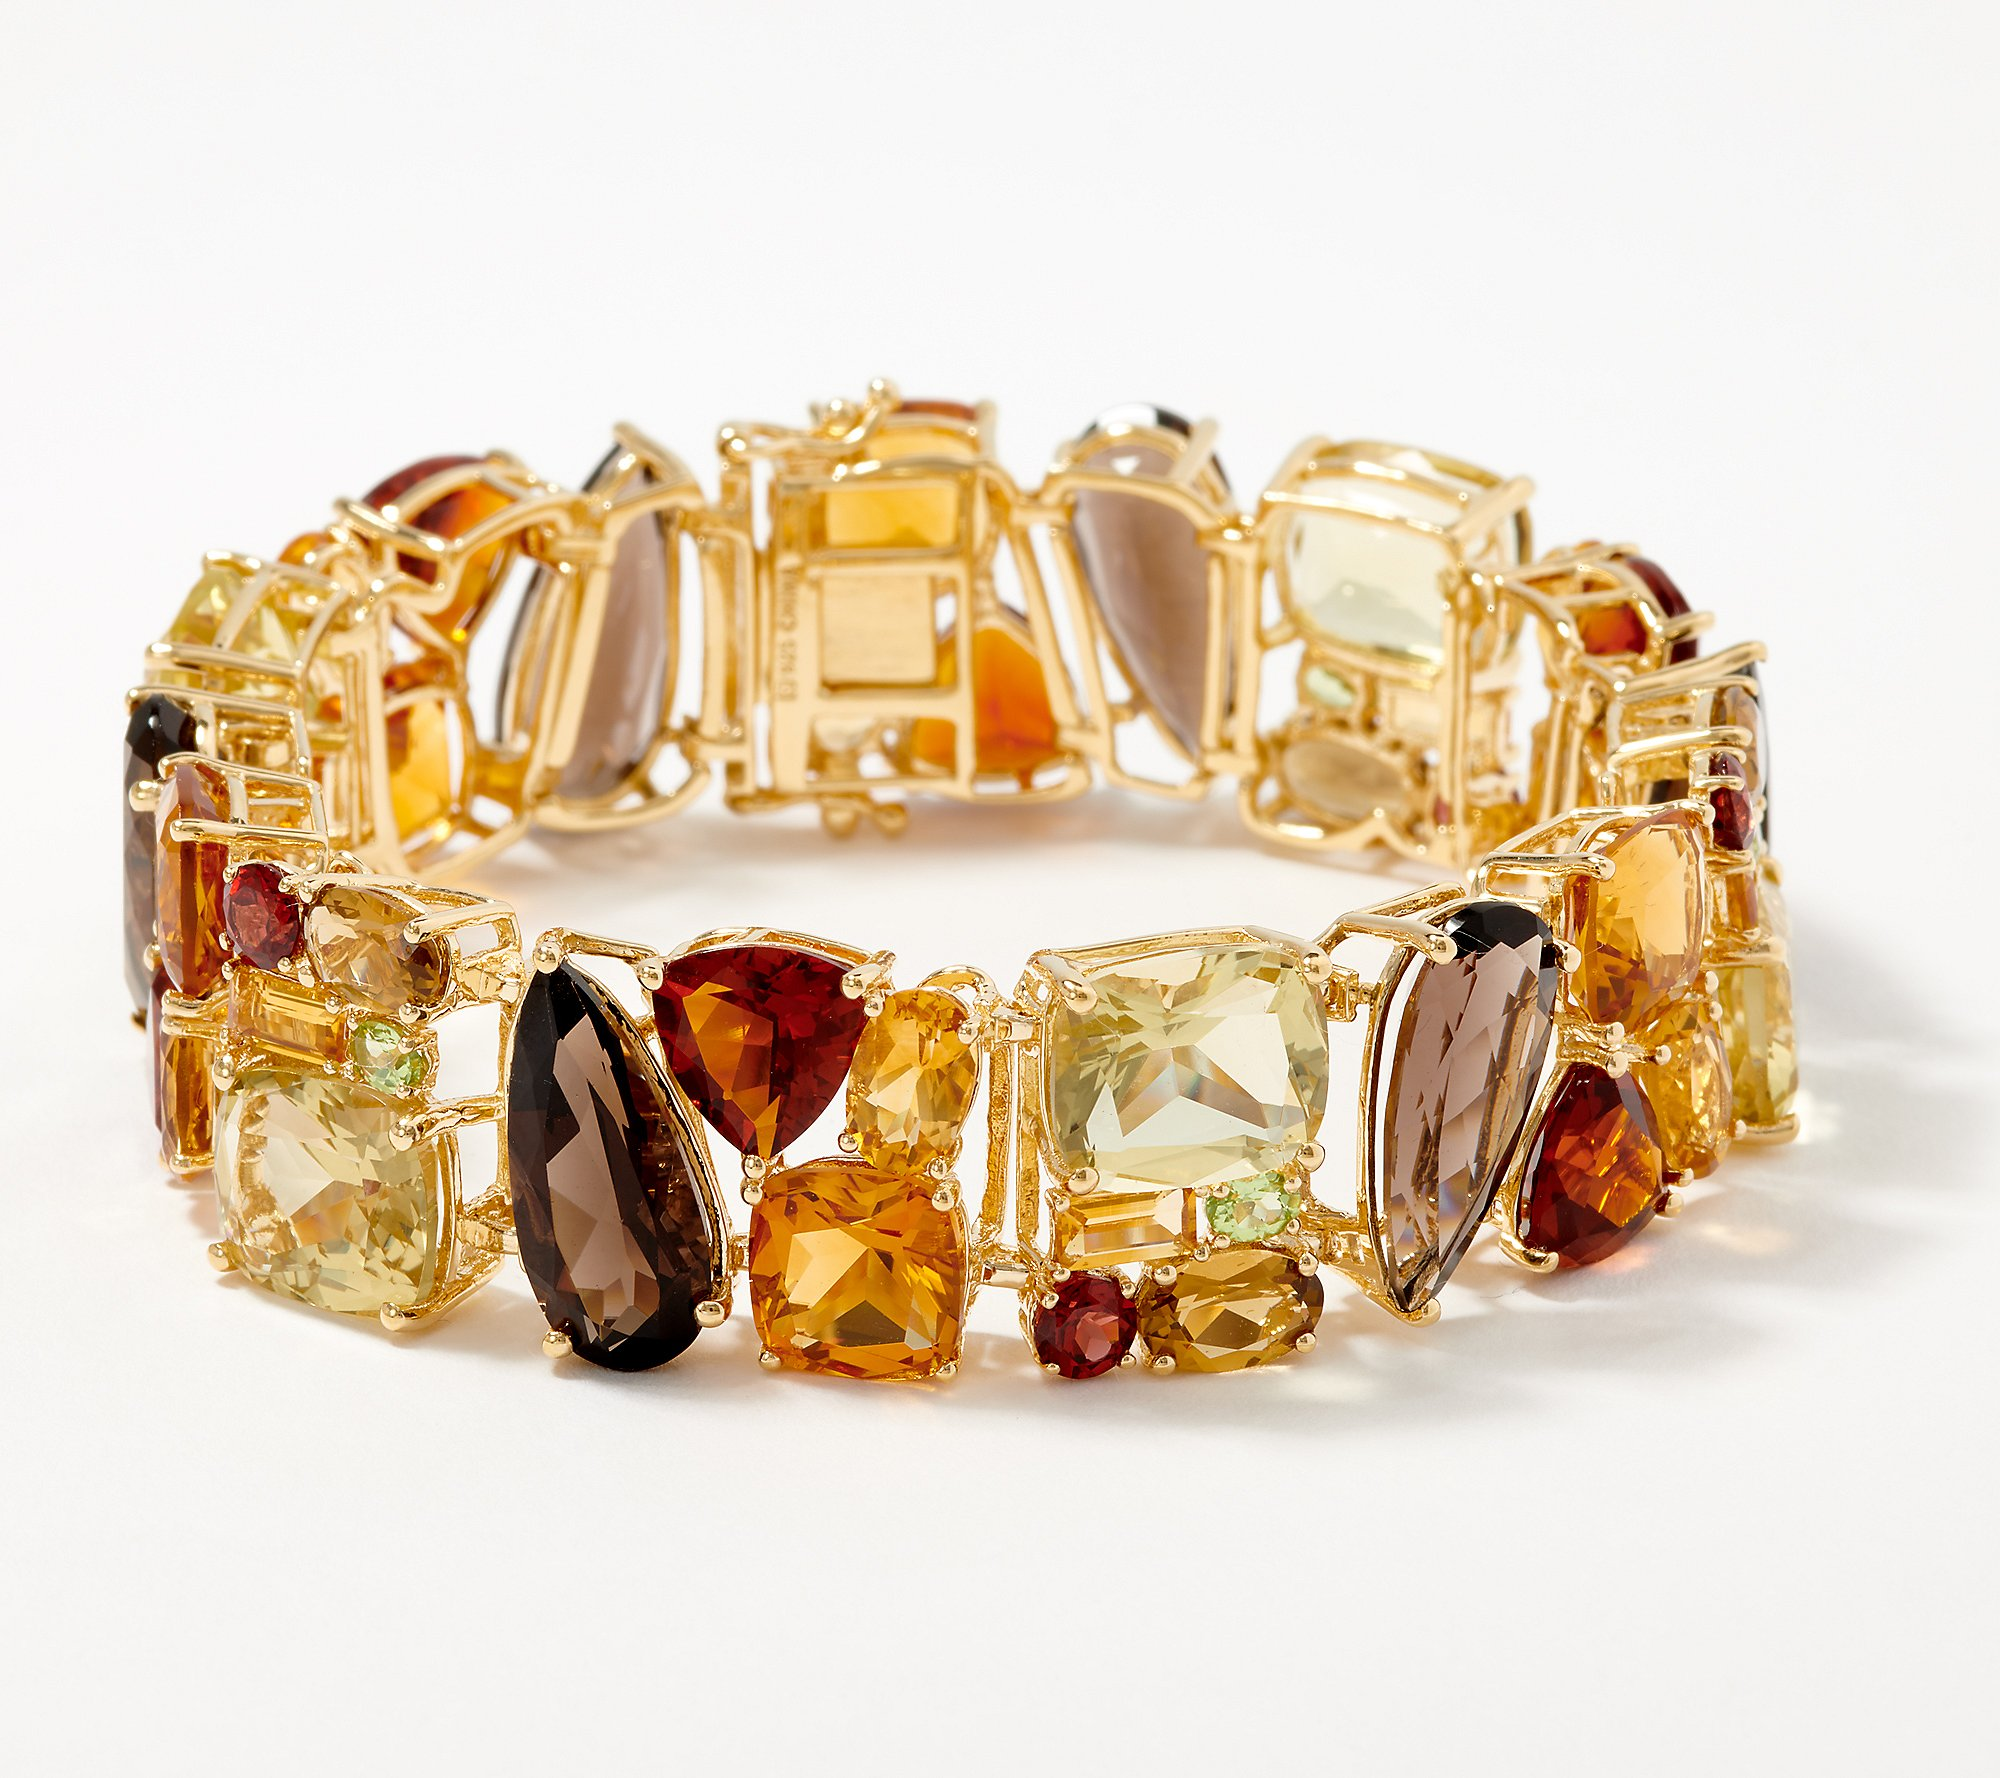 Multi Color TourmalineBracelet GemstoneOctober BirthstoneHealing Crystal BraceletBeaded BraceletCrystal BraceletGift for HerGS575